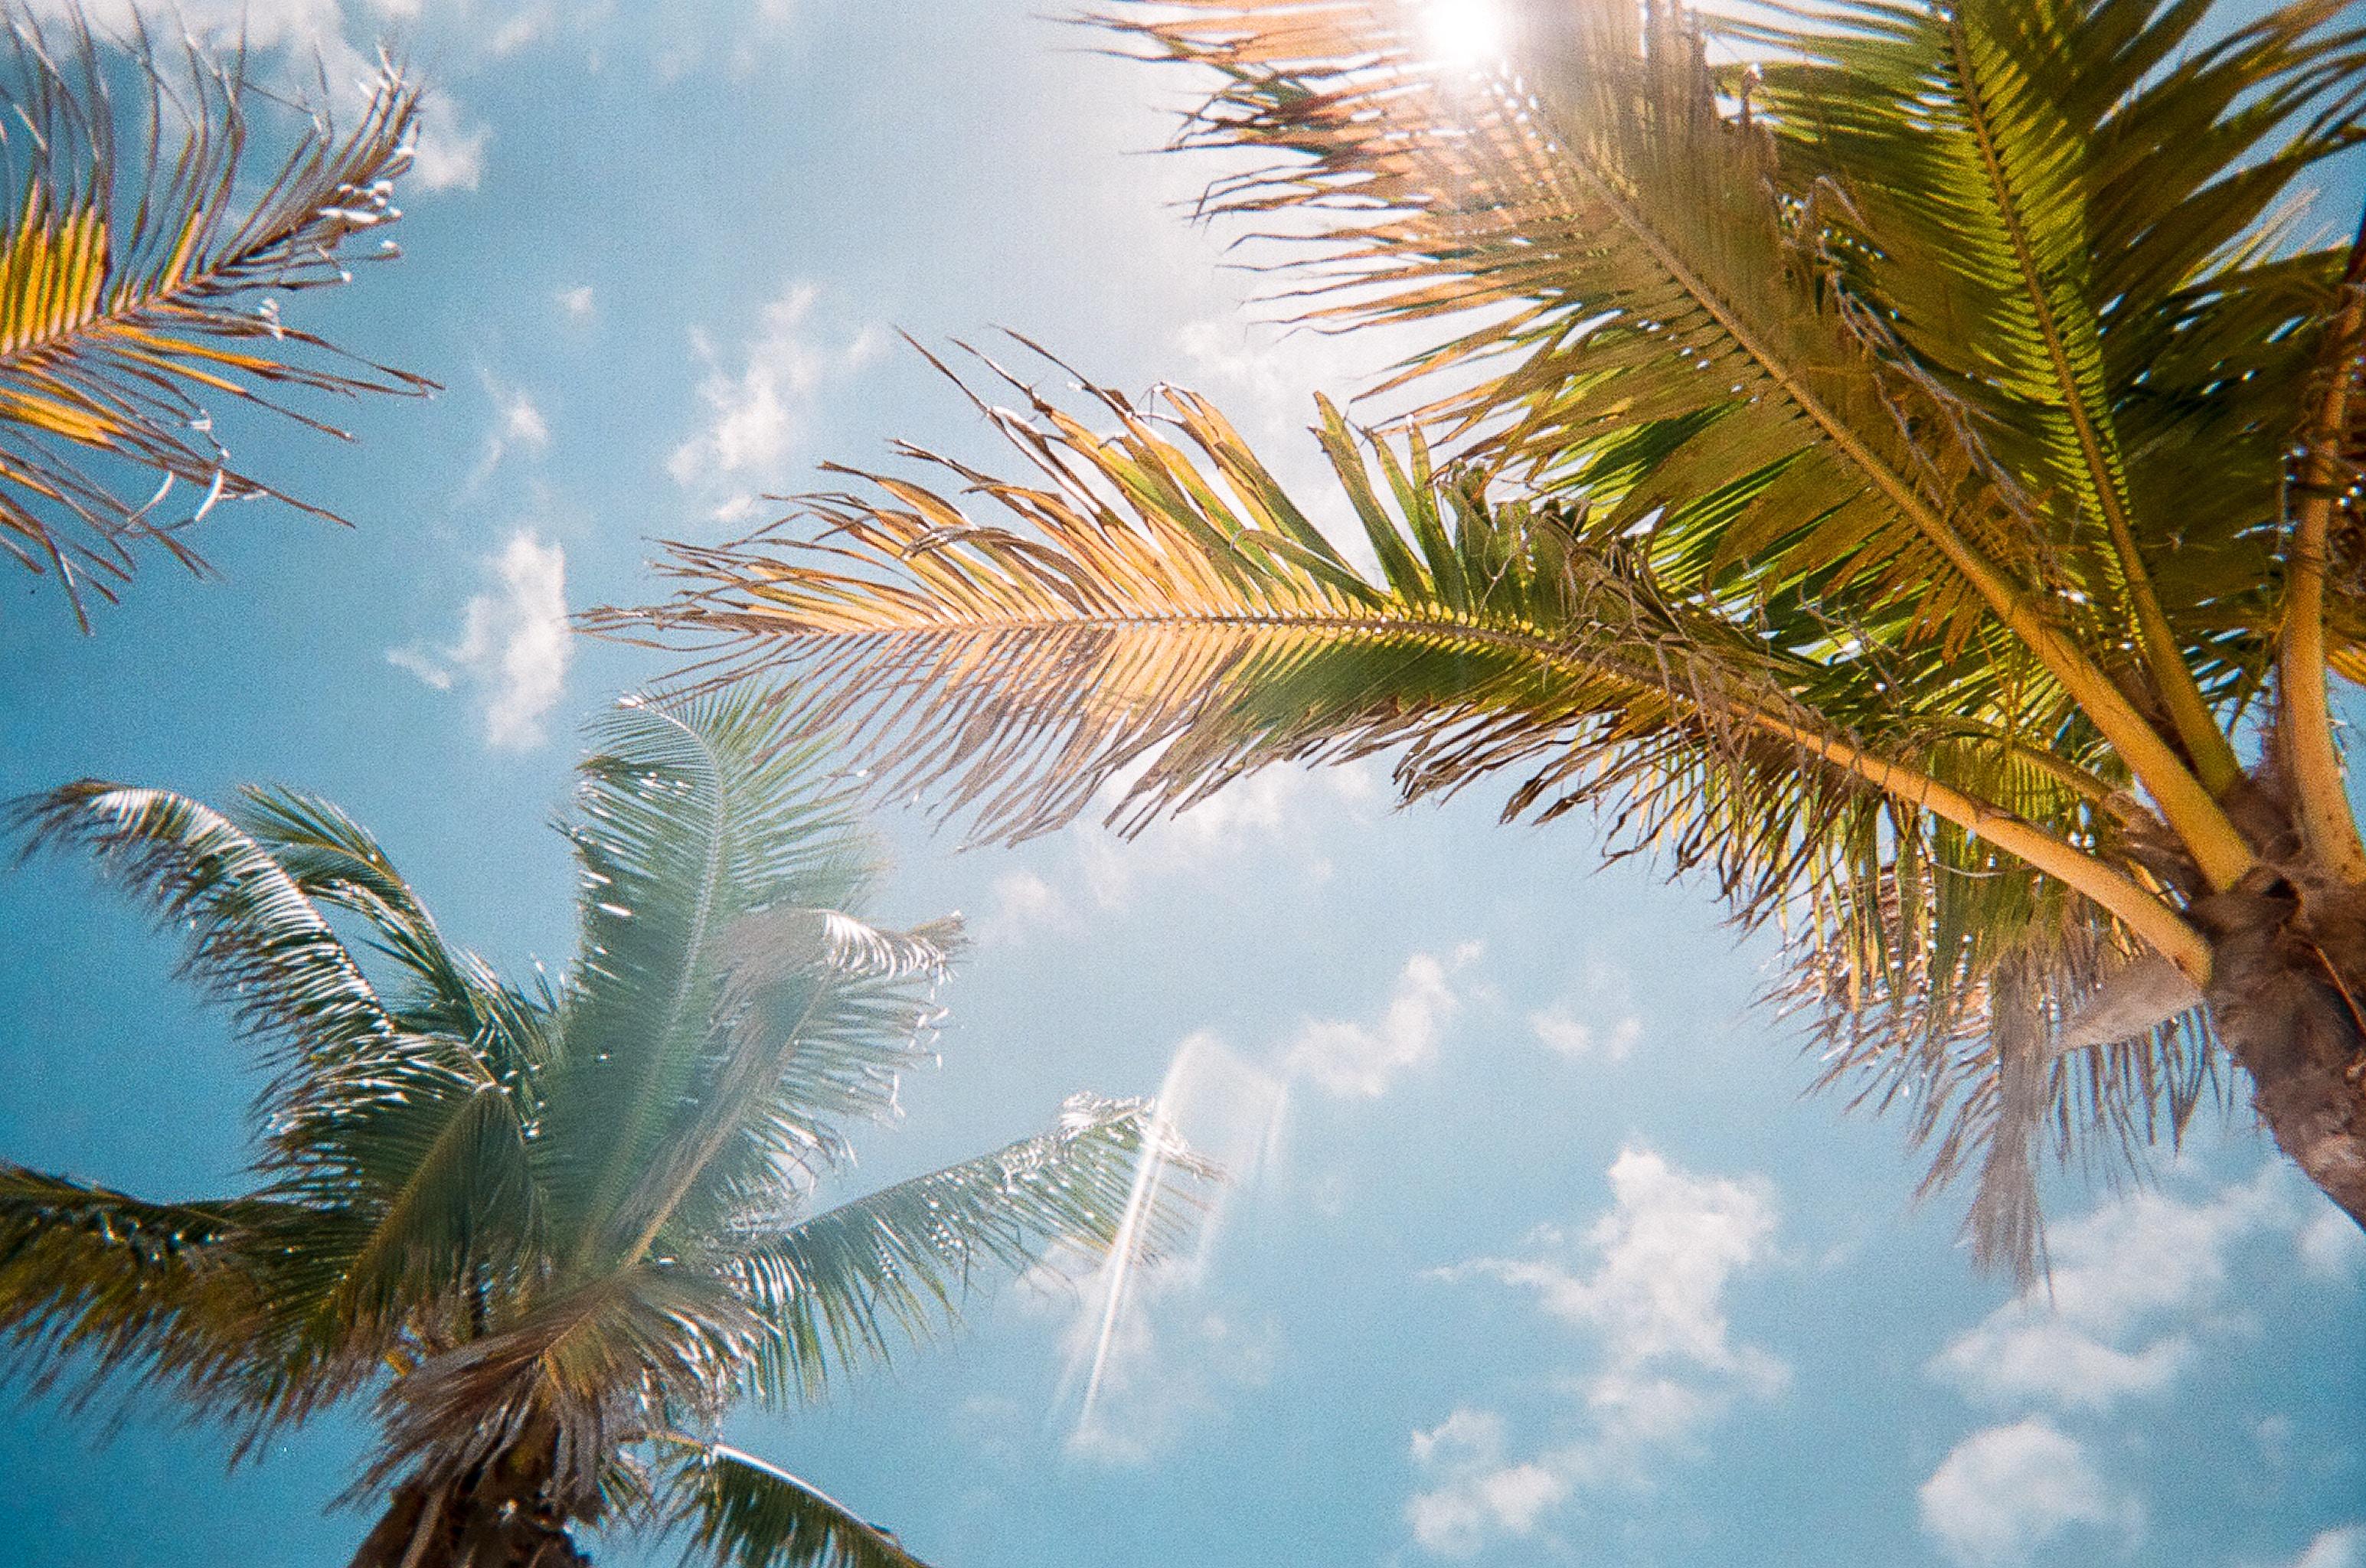 Florida Sunshine Through The Palm Trees